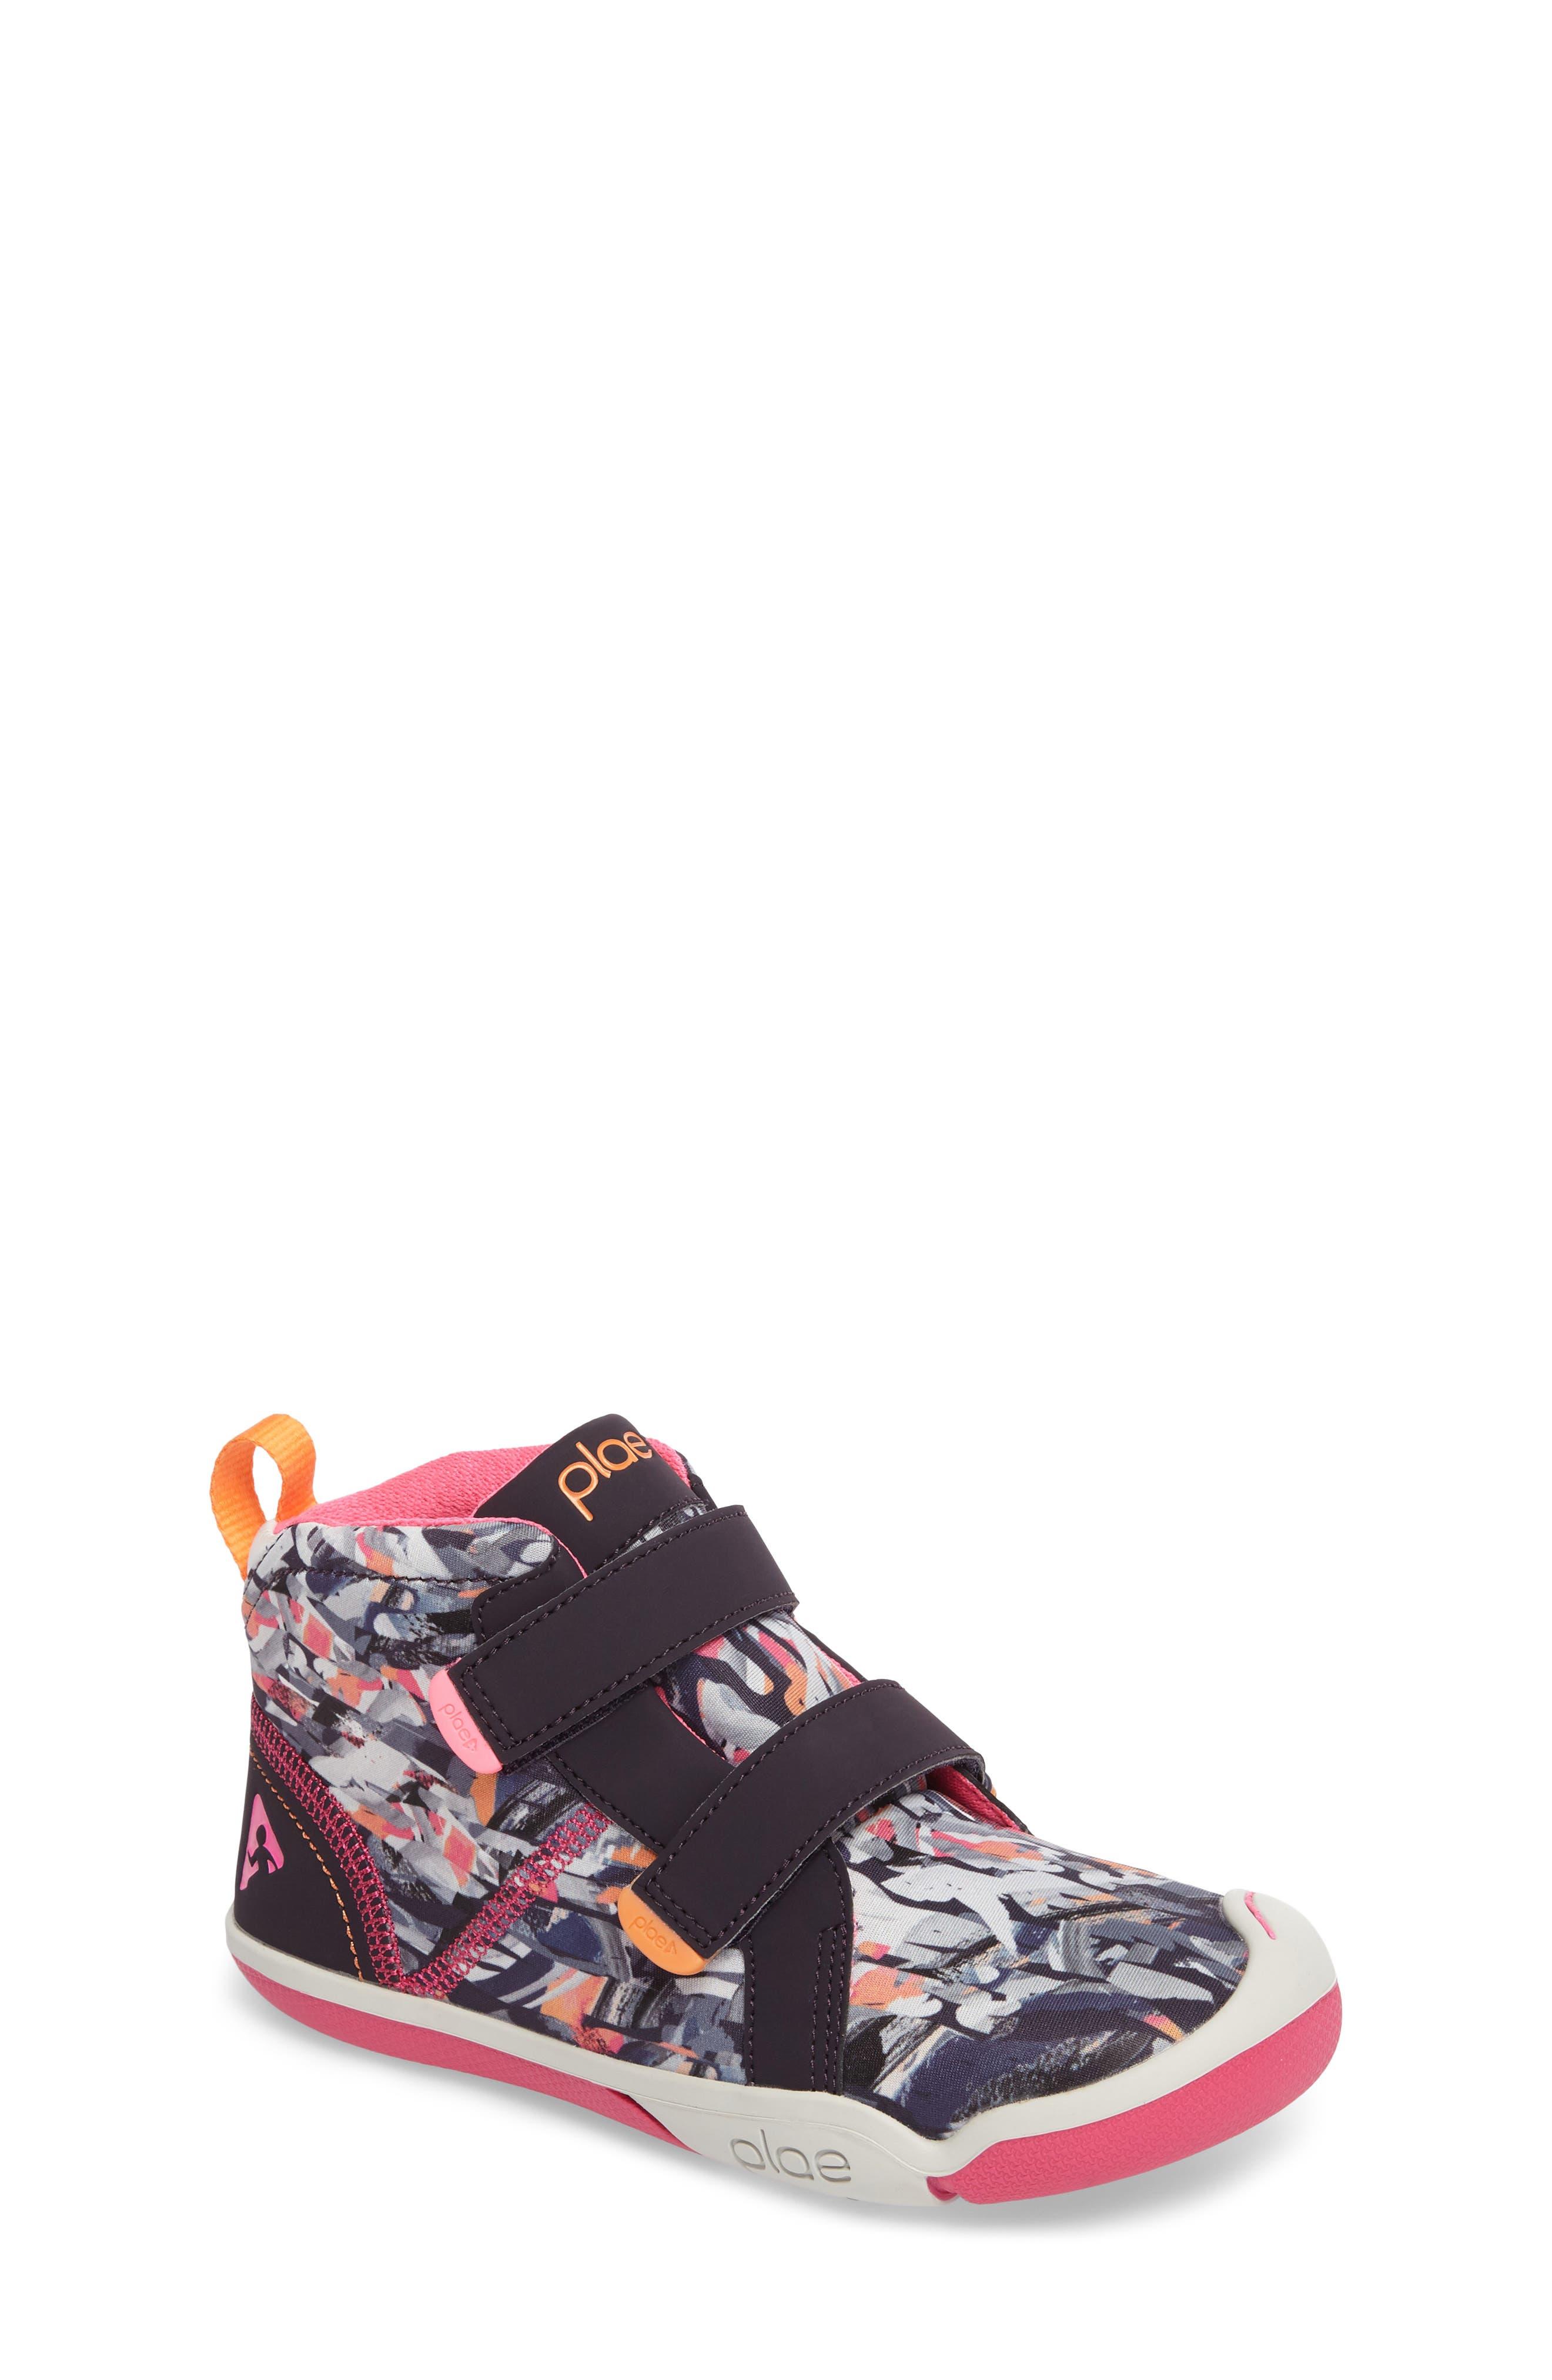 Max Customizable Mid Top Sneaker,                             Main thumbnail 1, color,                             503